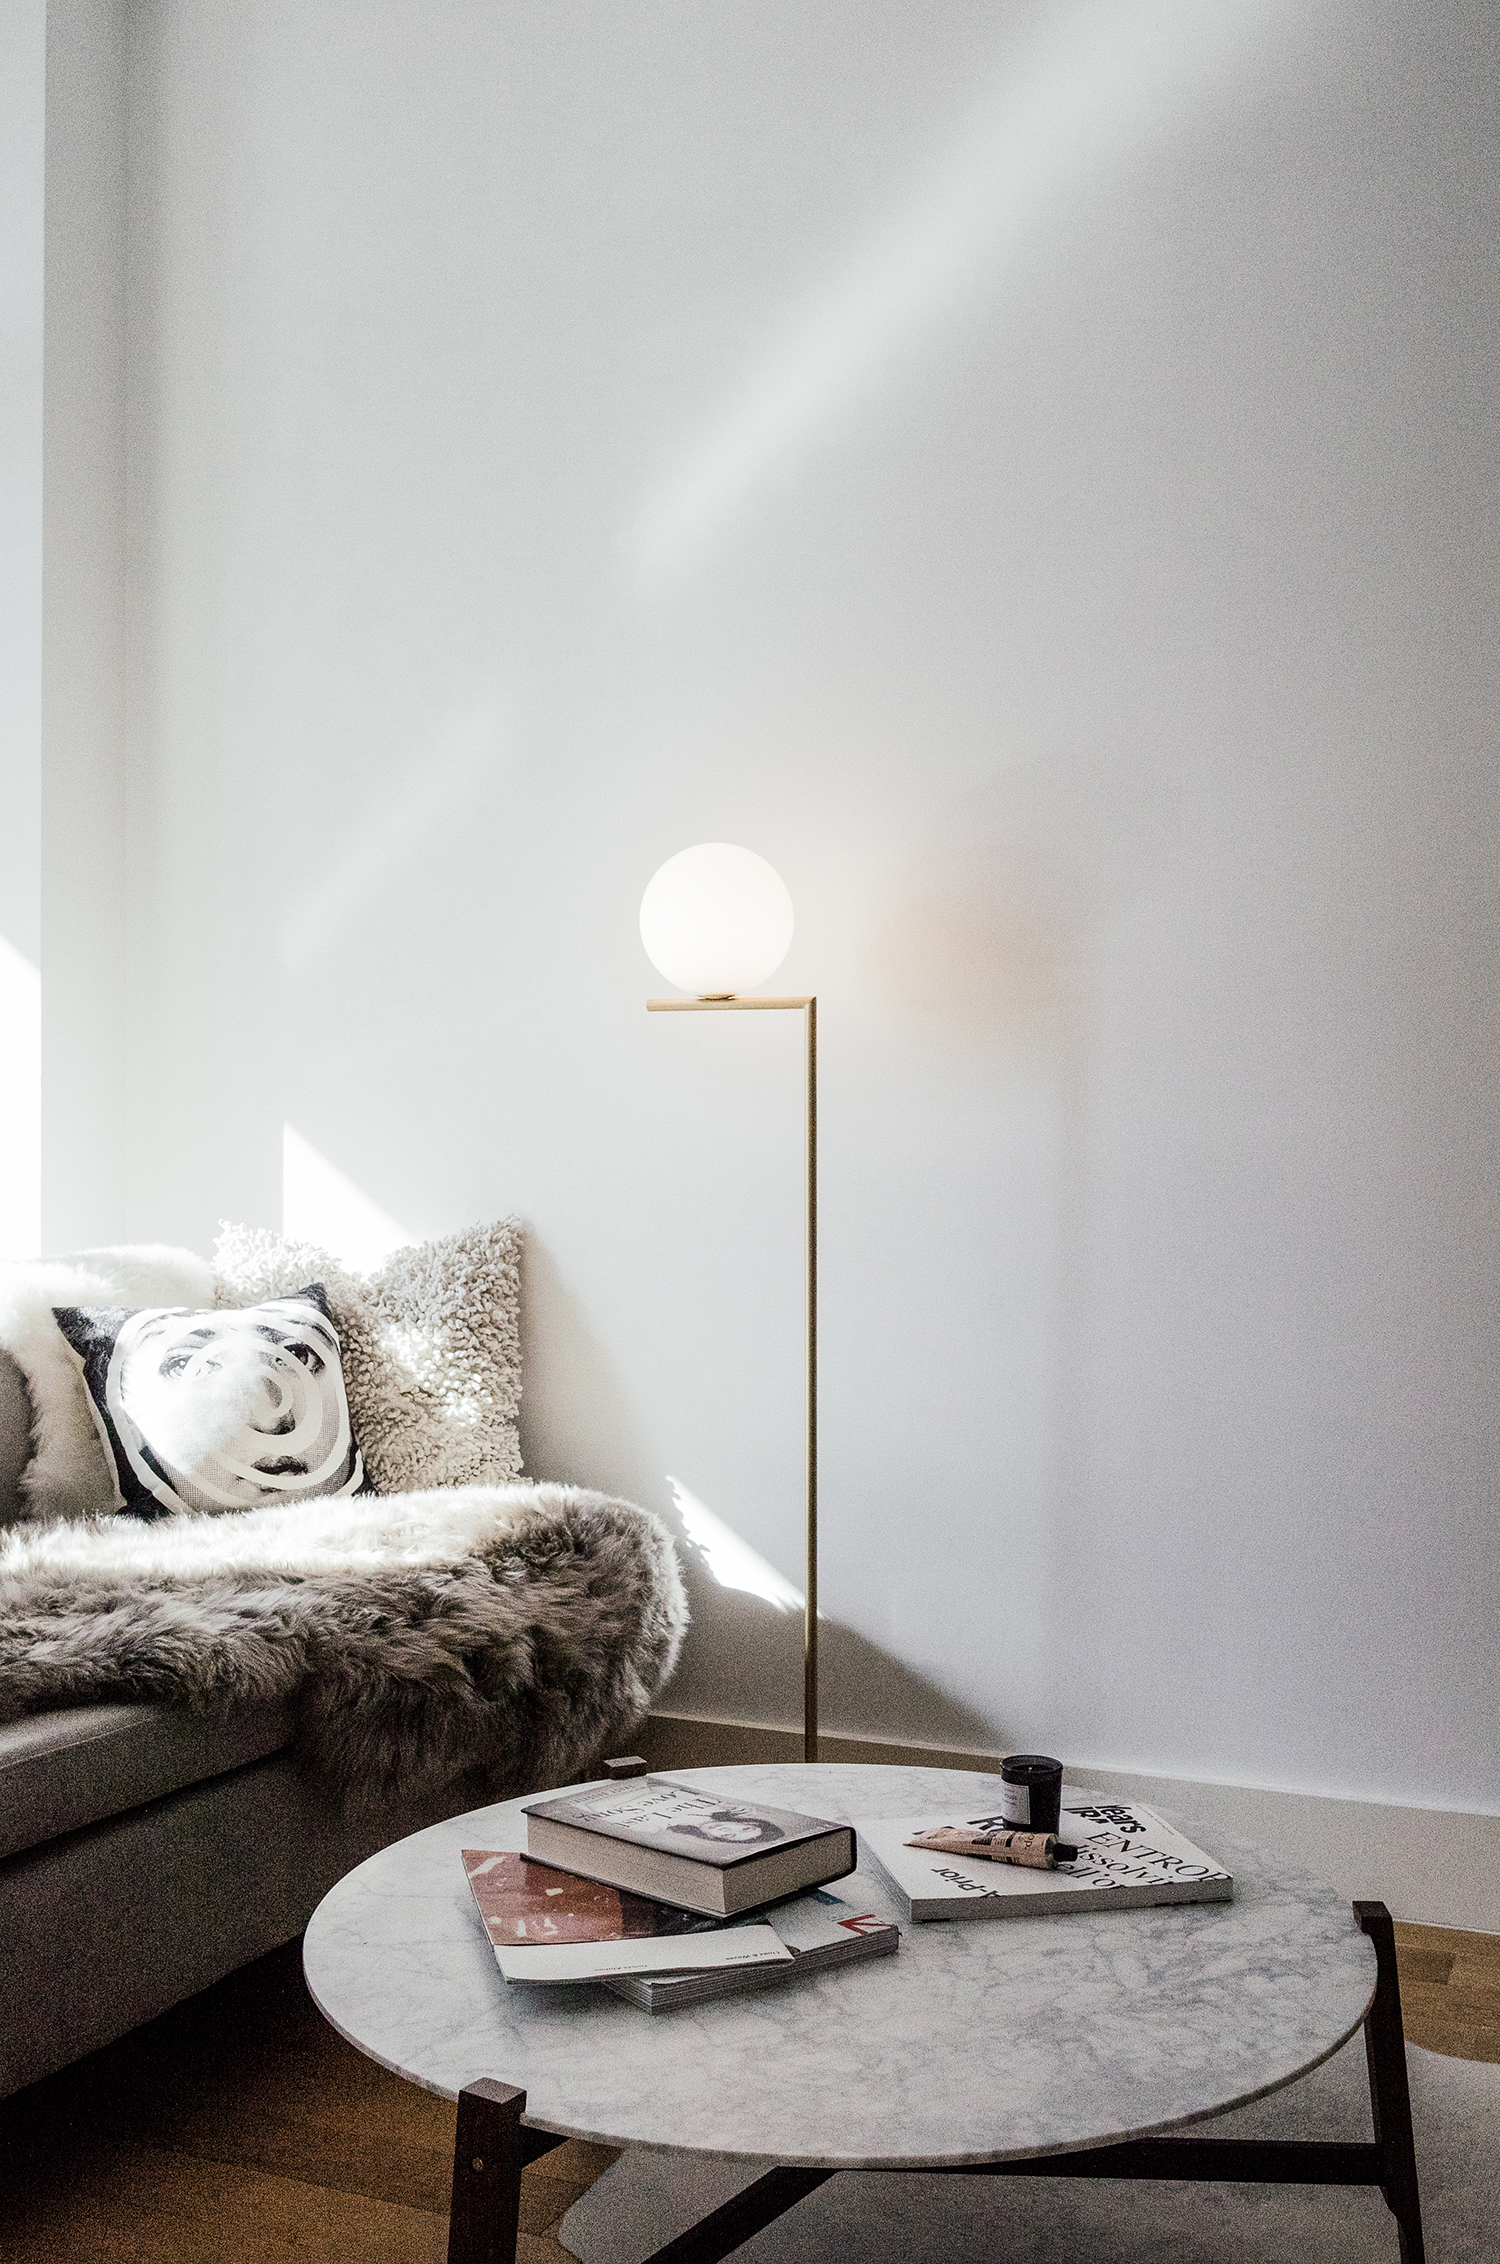 Sheepskin and FLOS Lamp from DwellStudio